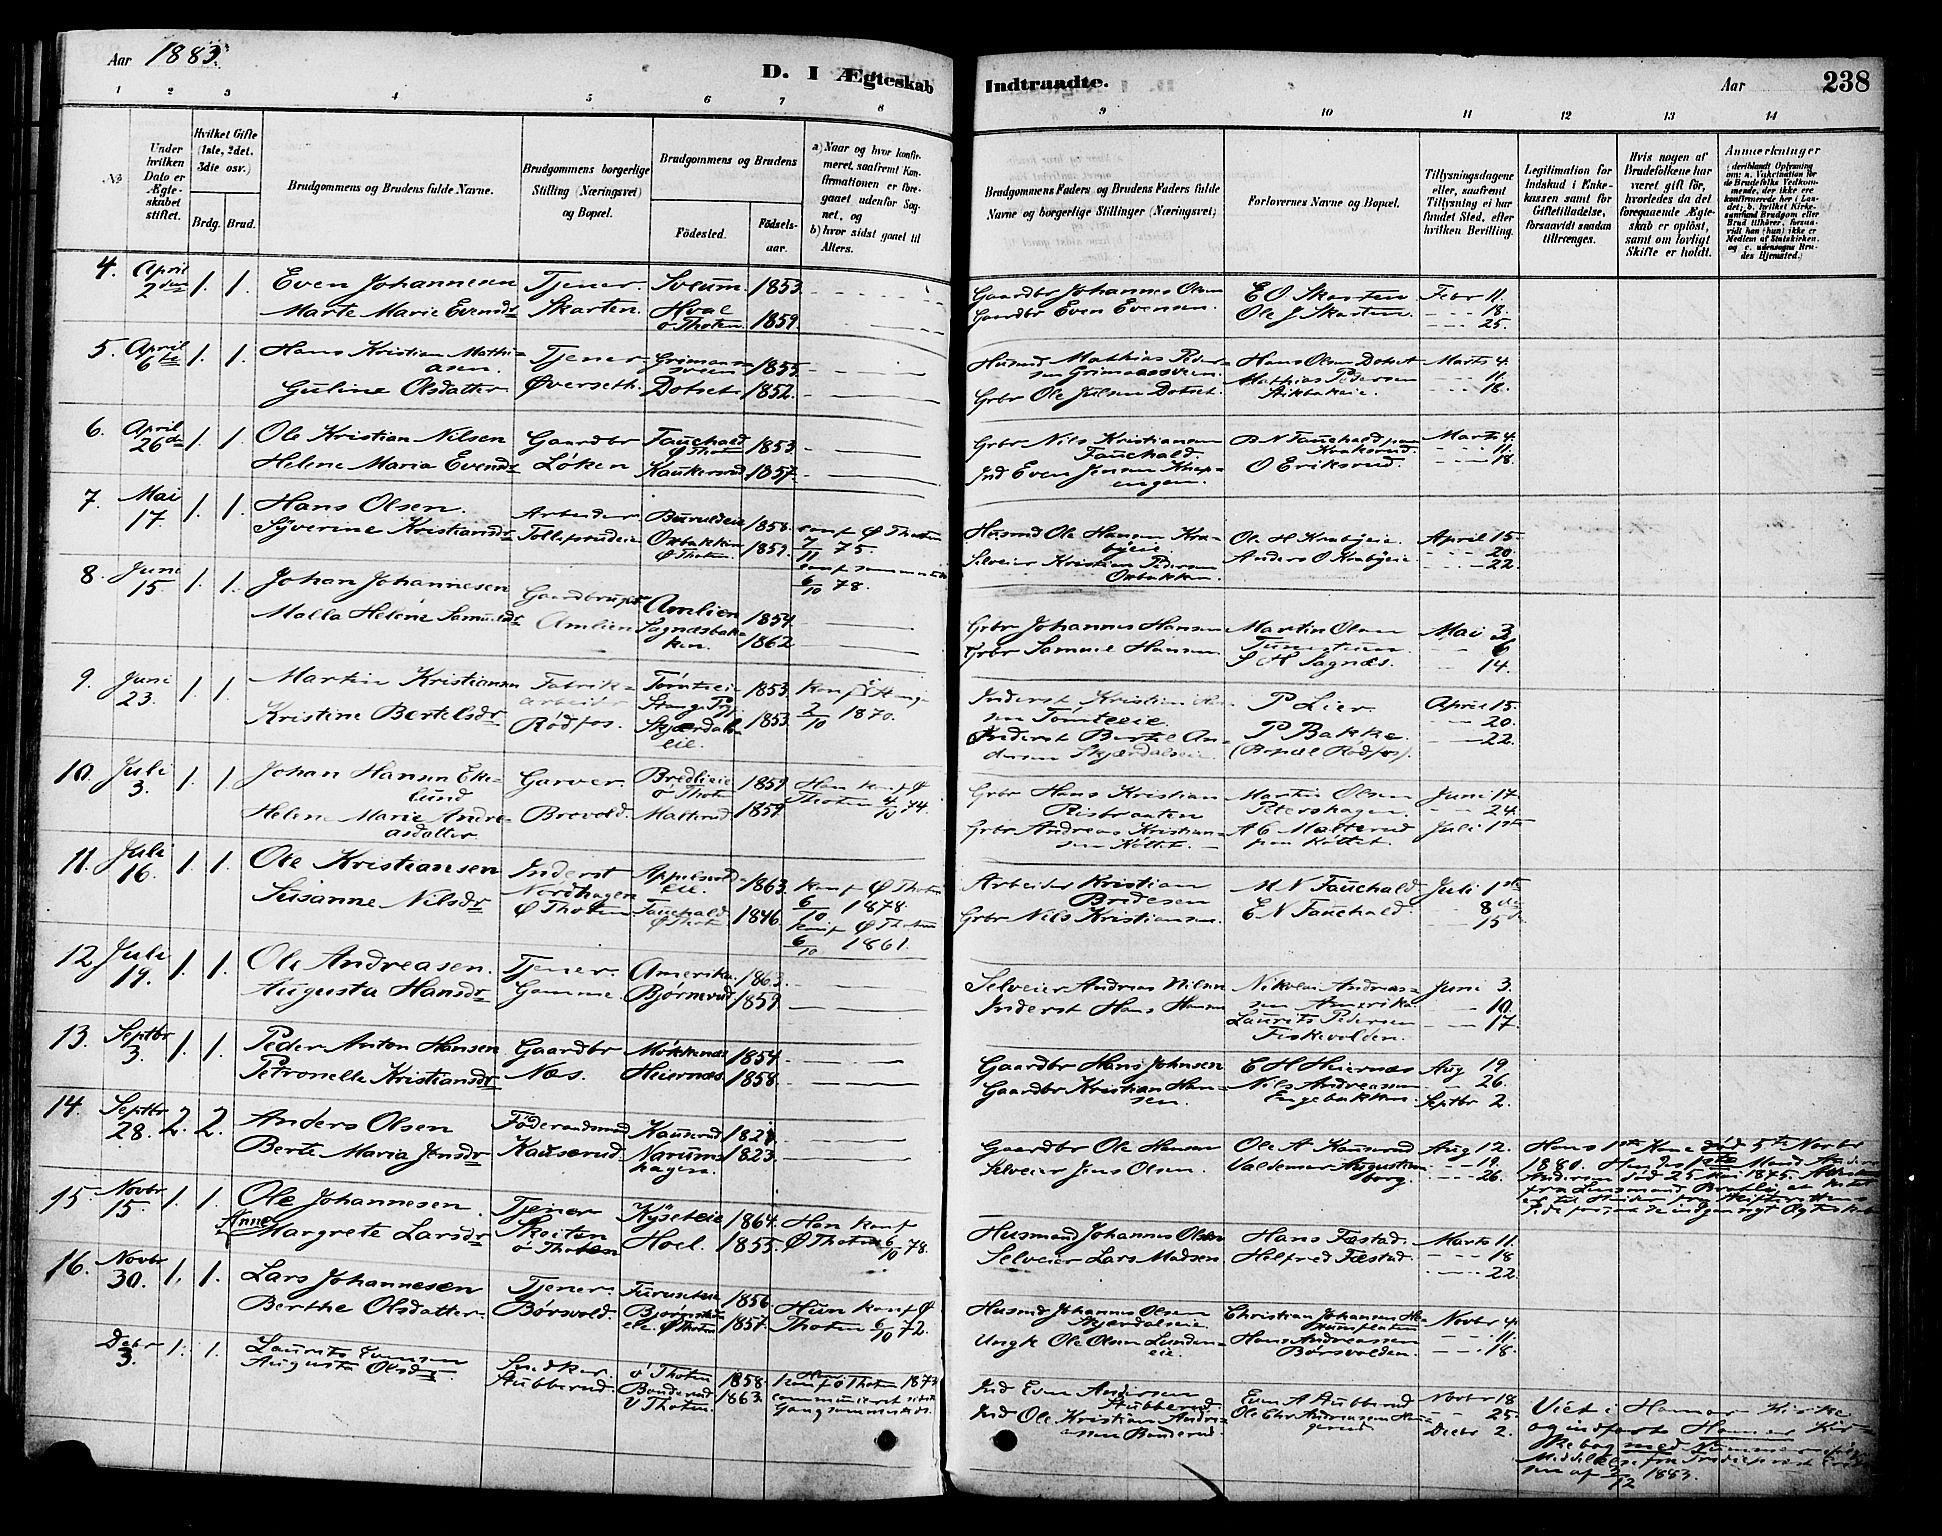 SAH, Vestre Toten prestekontor, H/Ha/Haa/L0009: Ministerialbok nr. 9, 1878-1894, s. 238